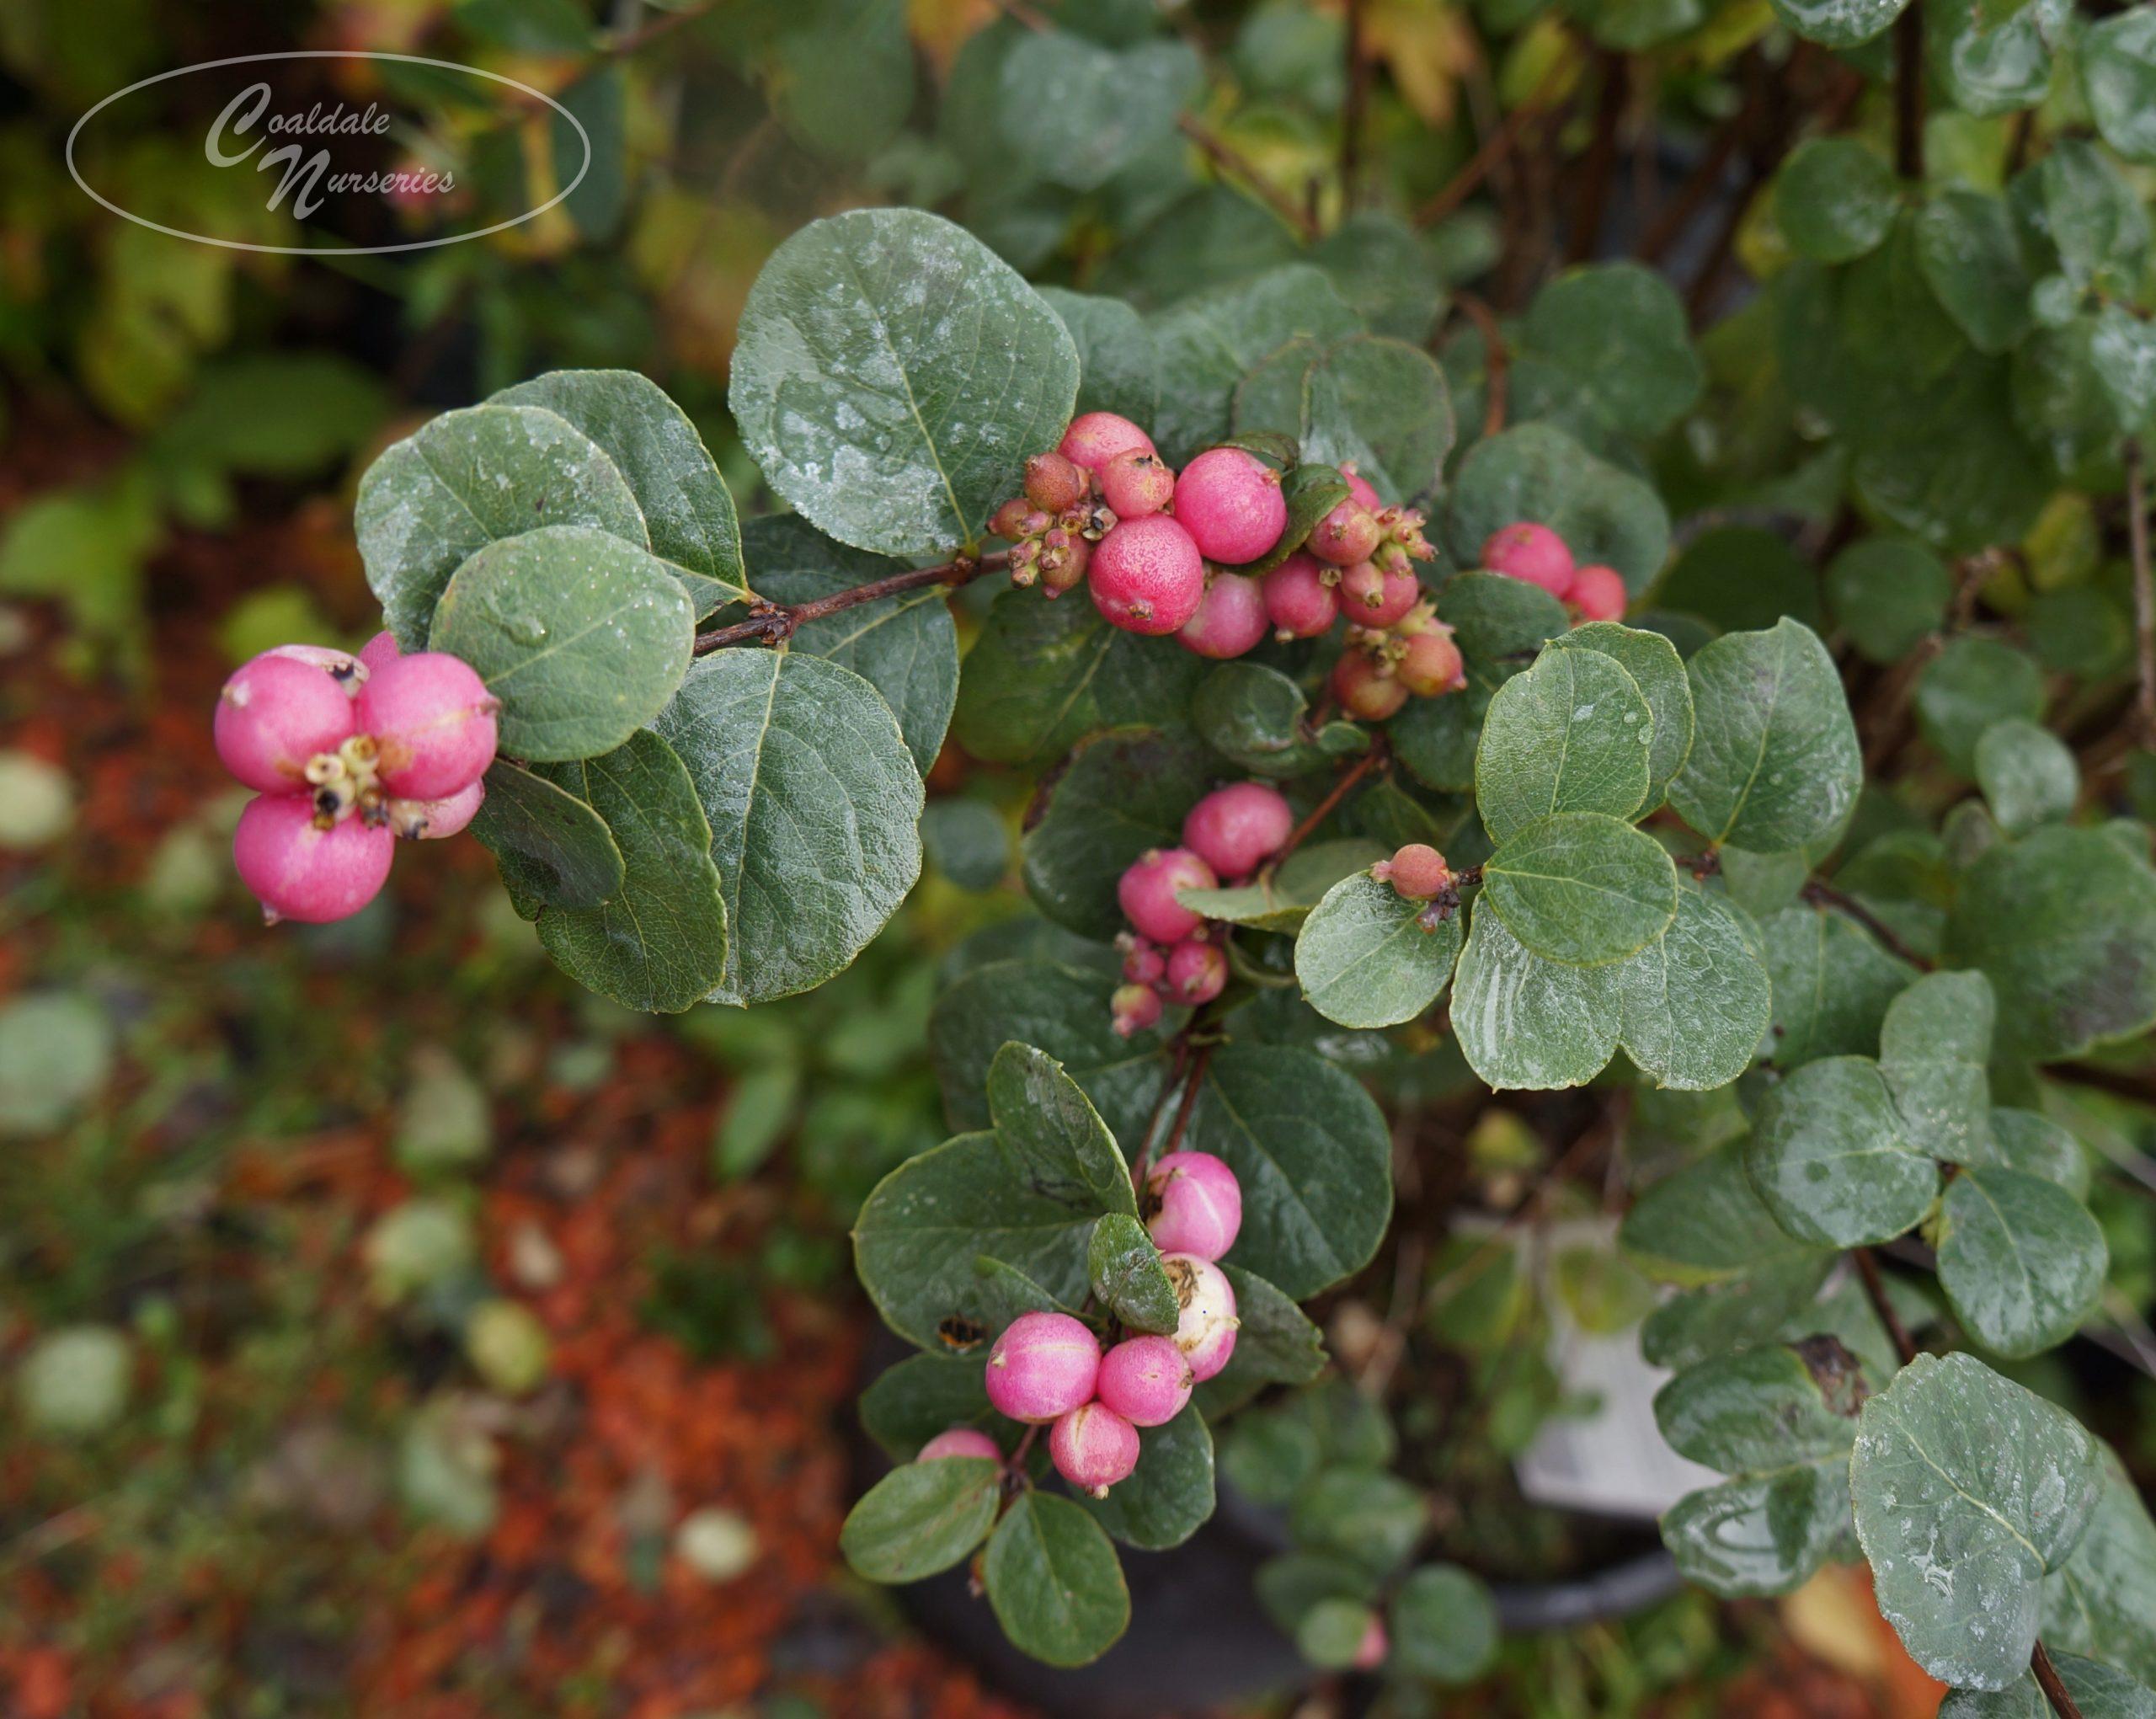 Marleen Pink Snowberry Image